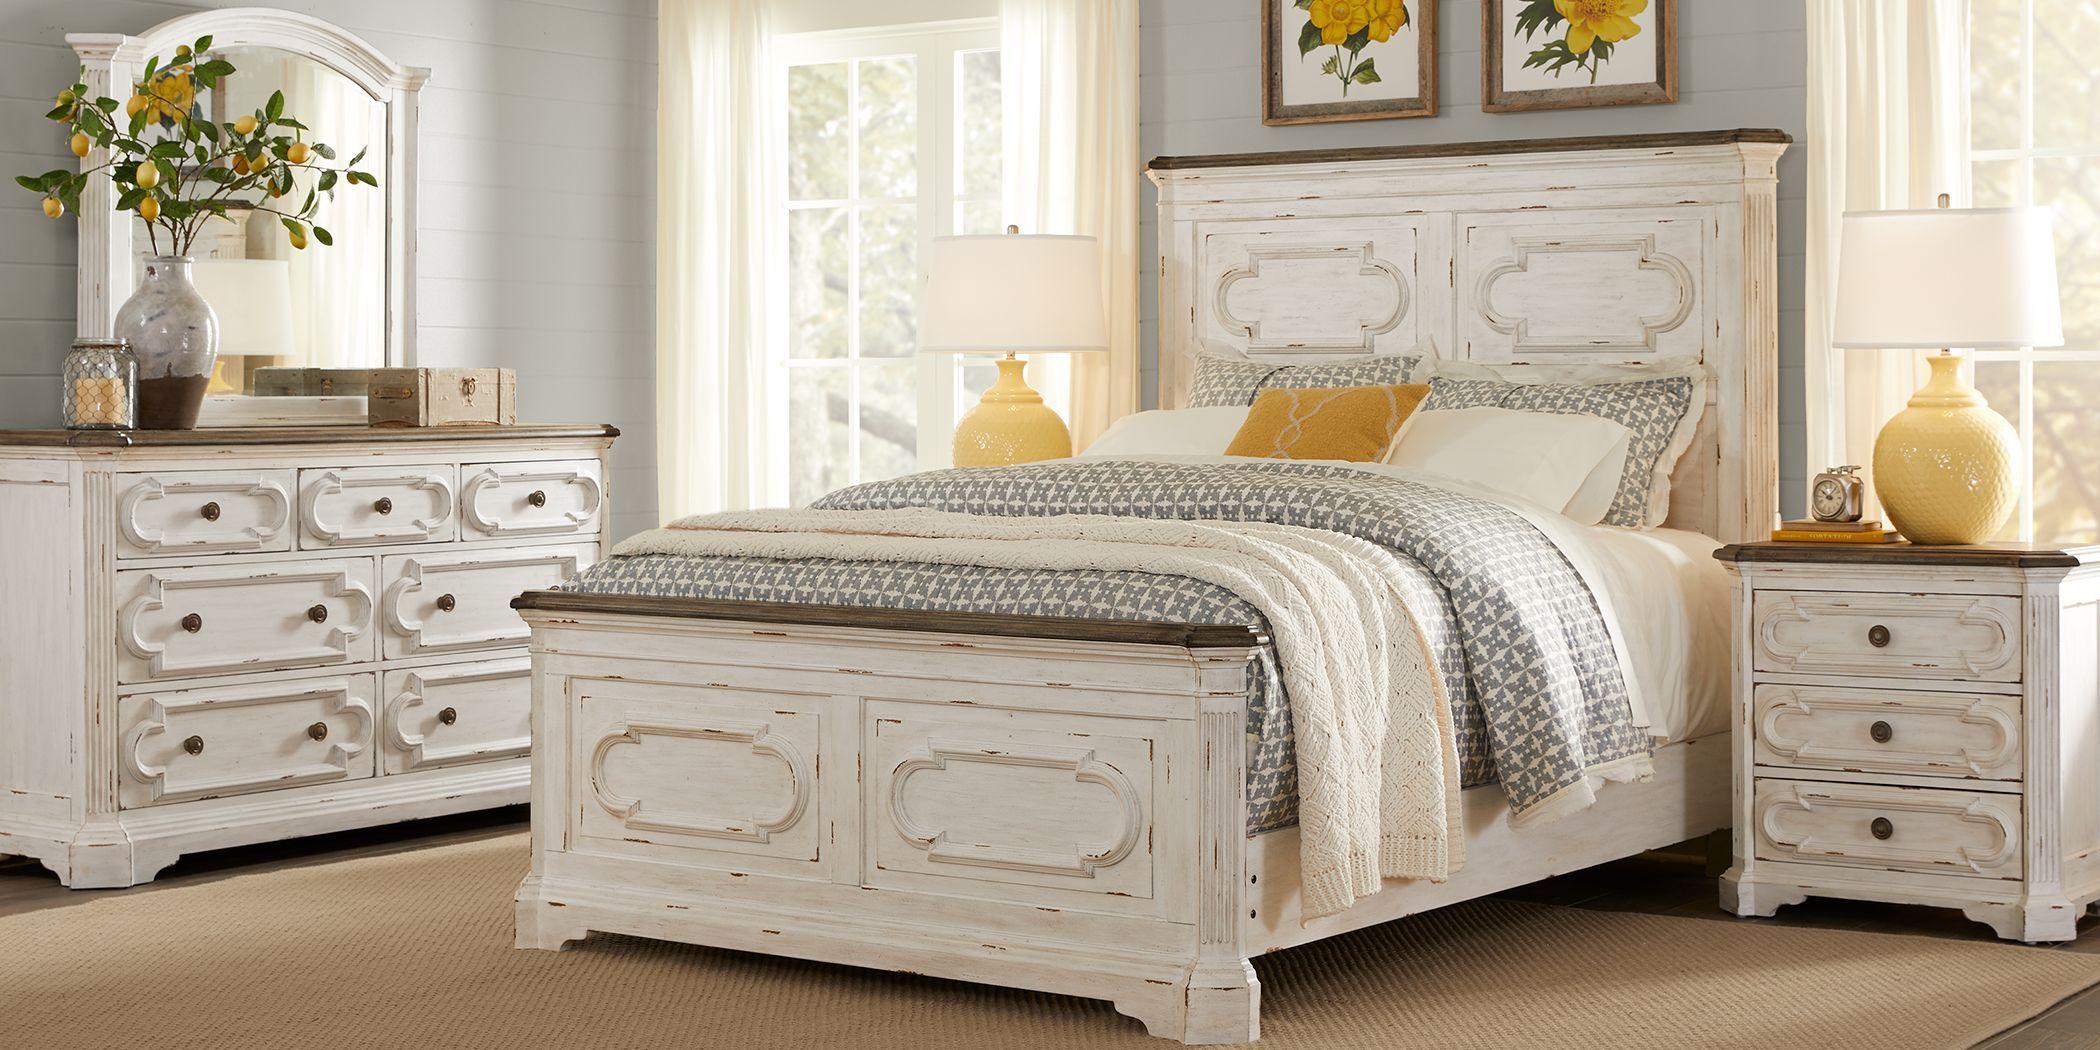 Lindenwood White 5 Pc Queen Panel Bedroom Rooms To Go Bedroom Bedroom Furniture Sets King Size Bedroom Sets